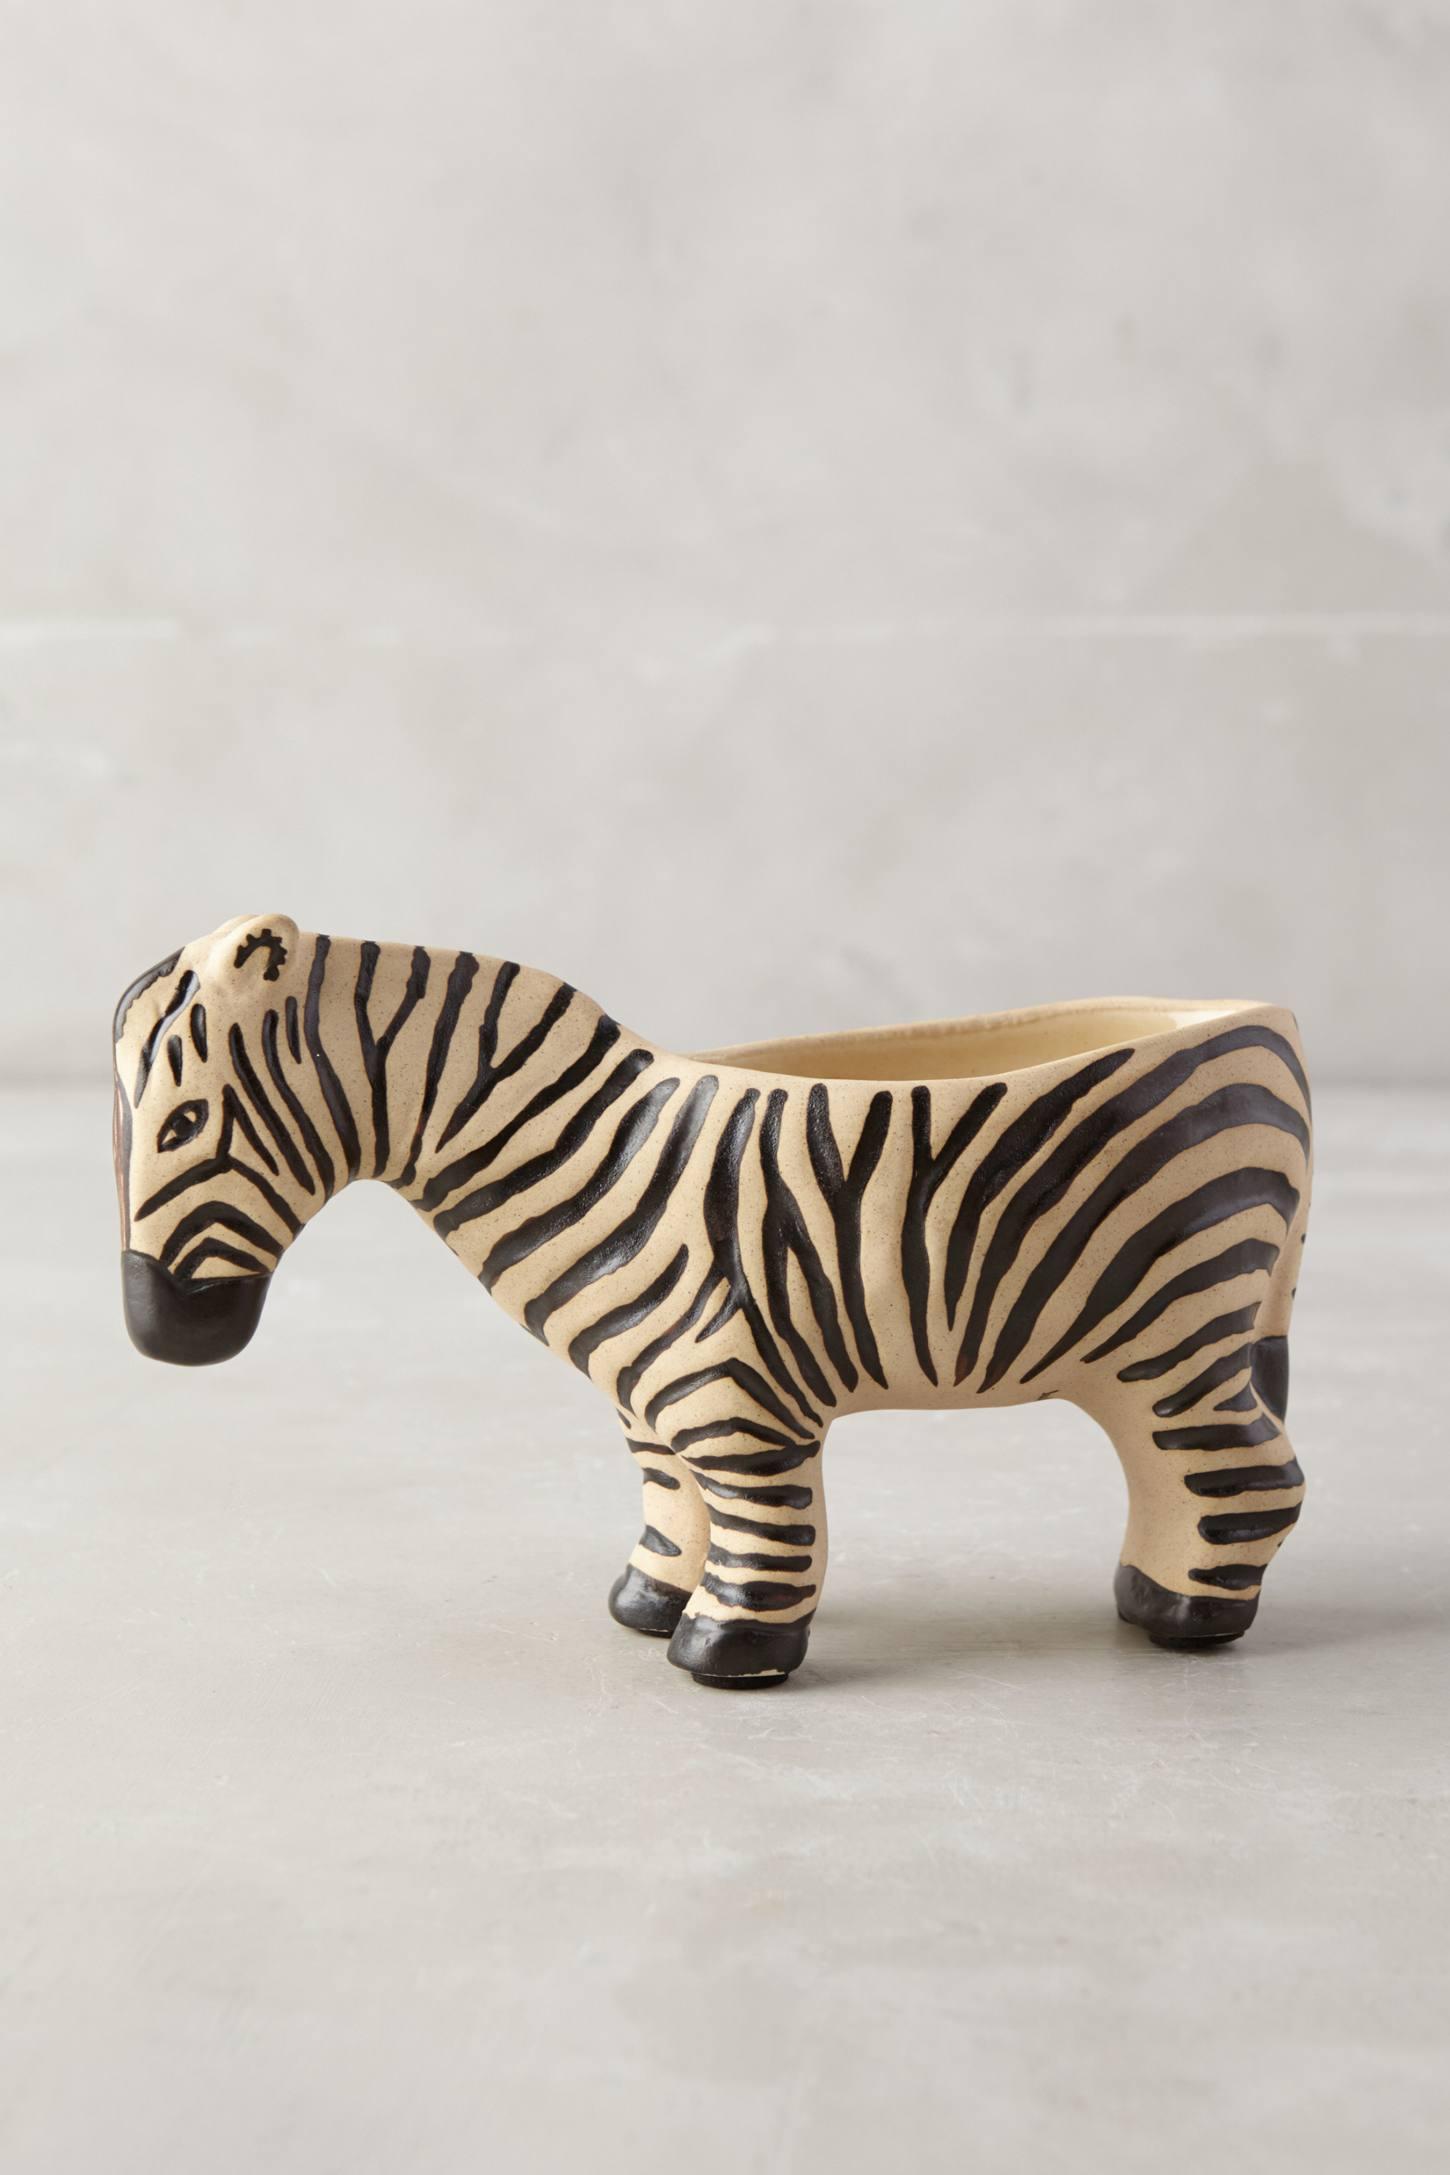 Wild Wanderer Zebra Planter